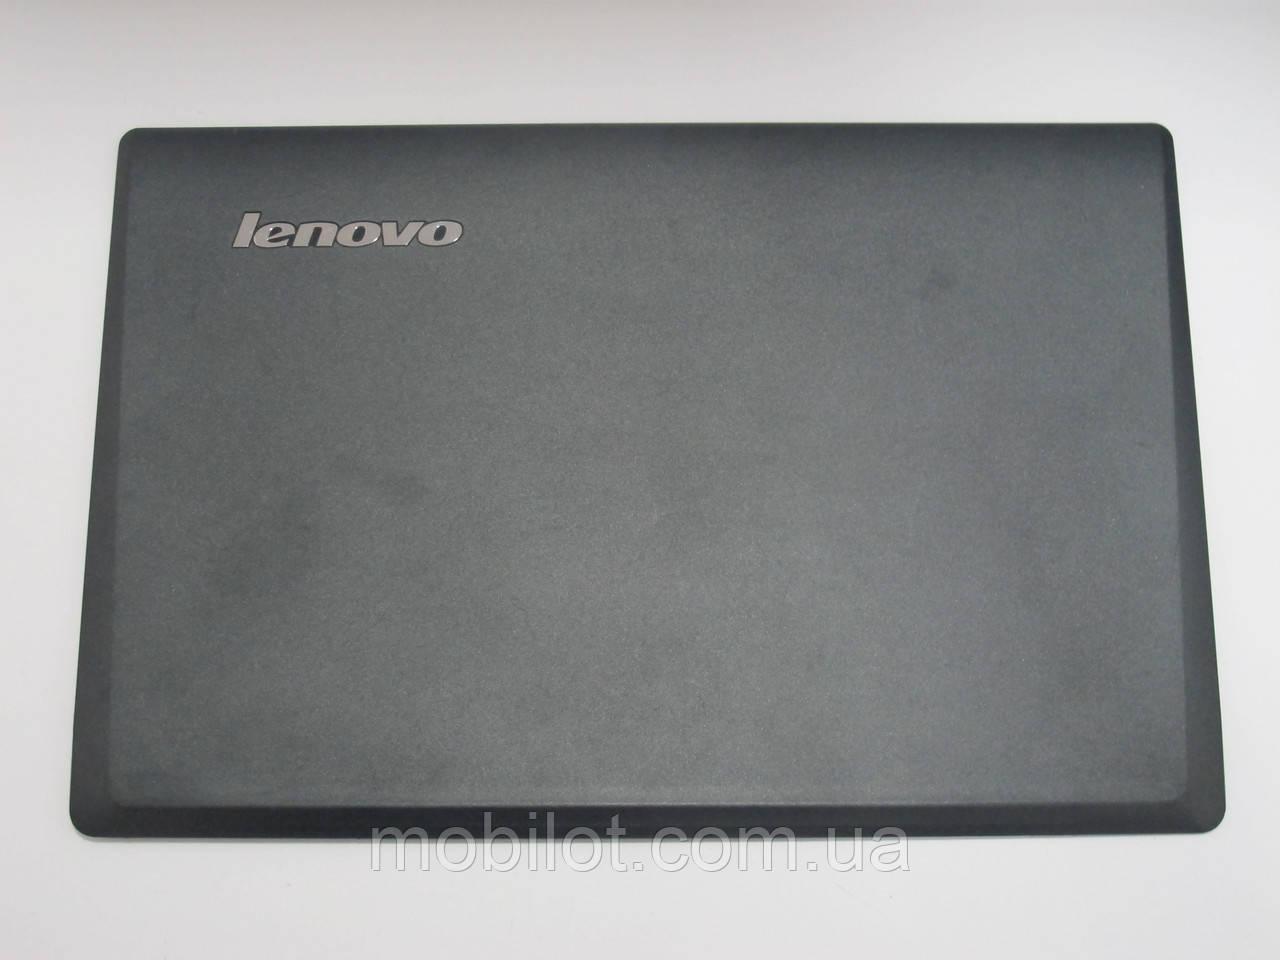 Часть корпуса (Крышка матрицы) Lenovo G560 / G565 (NZ-5156)